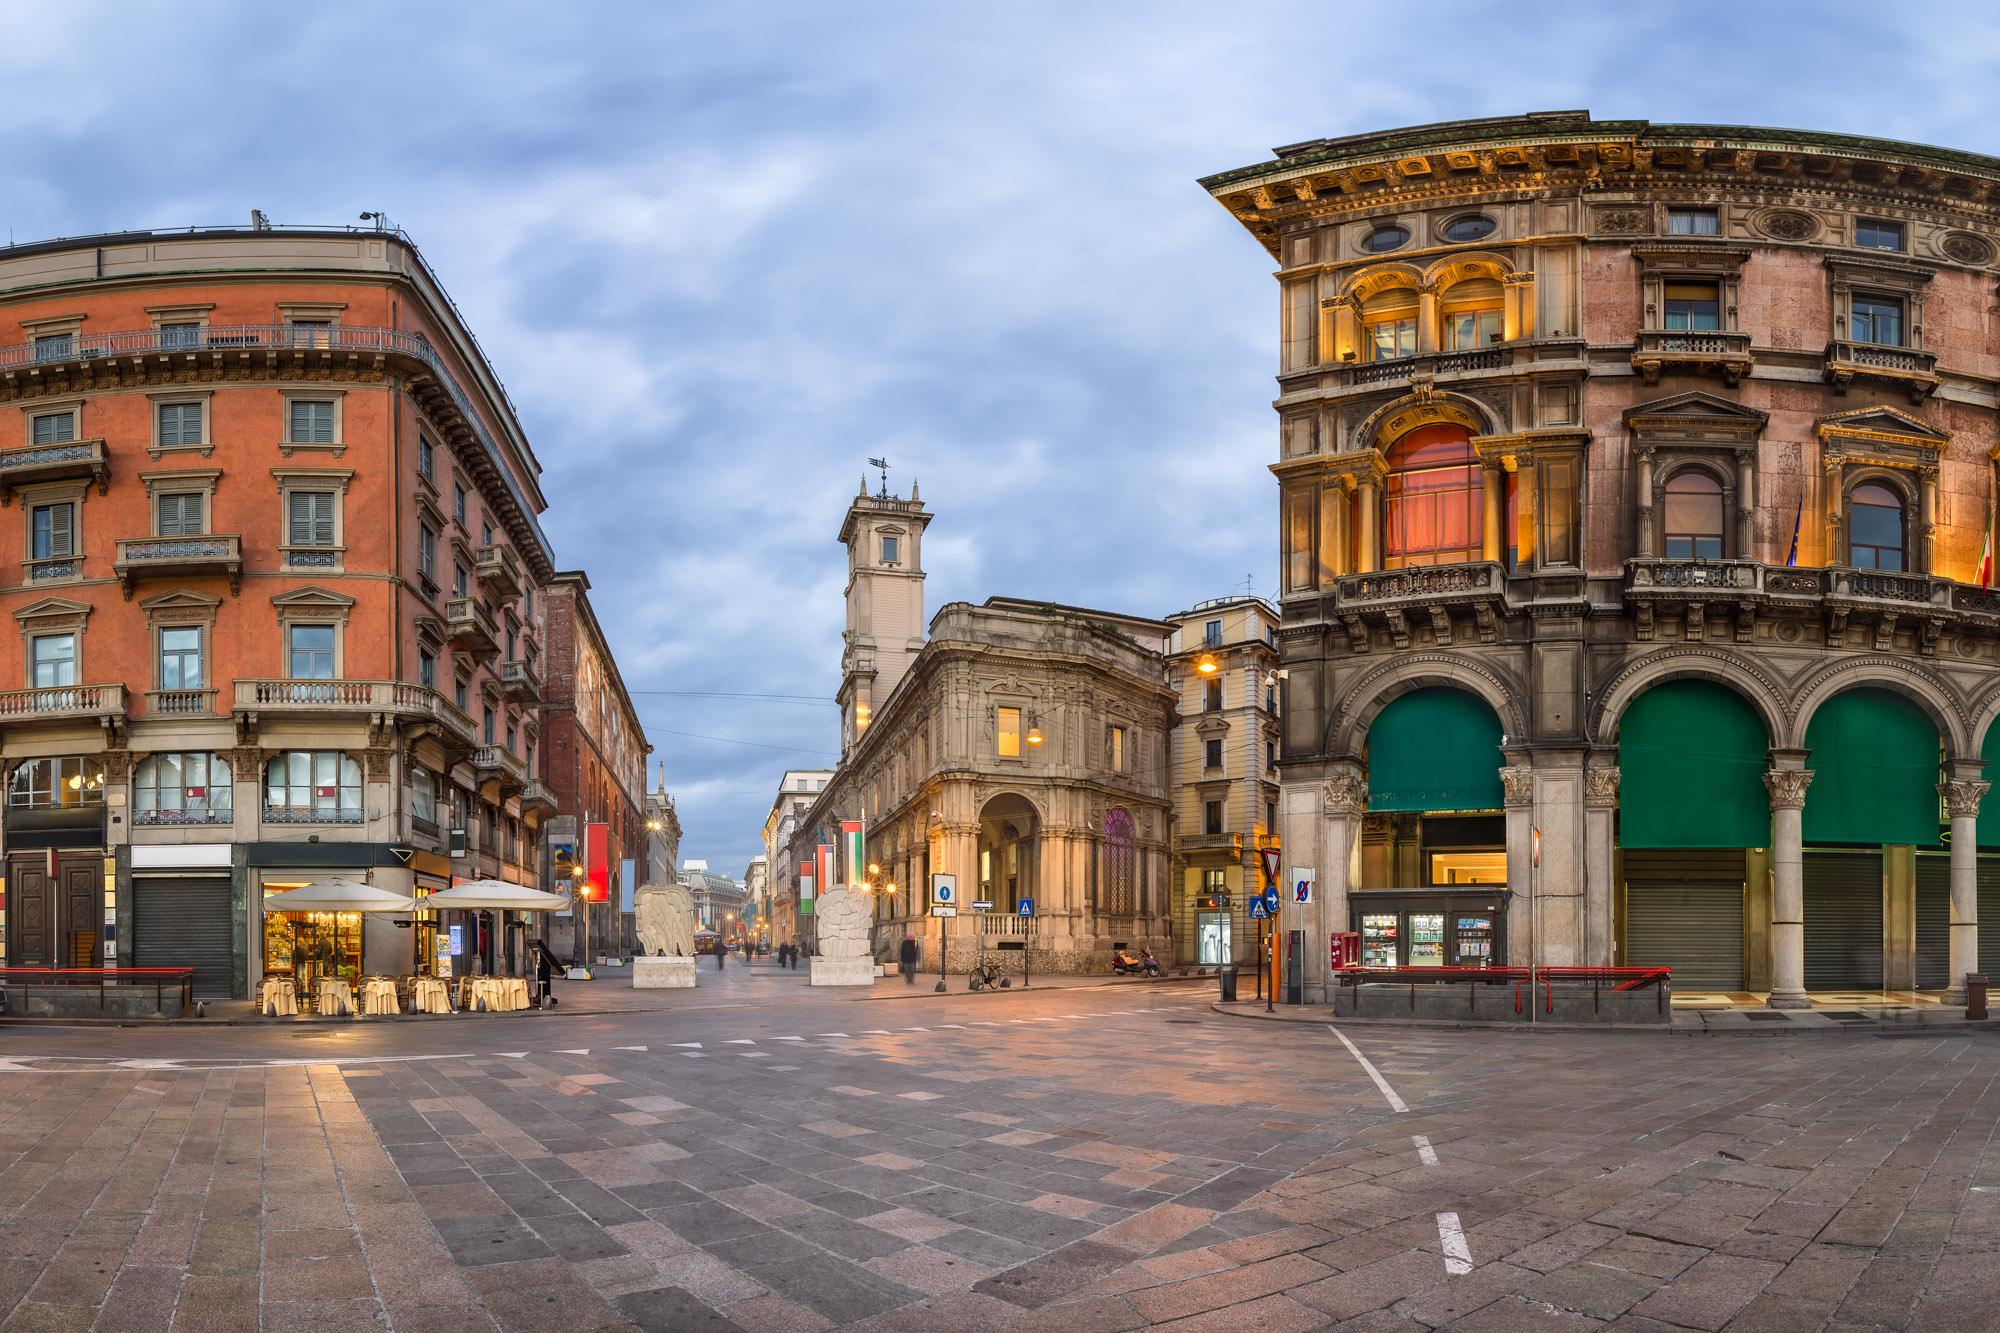 Piazza del Duomo and Via dei Mercanti, Milan, Italy